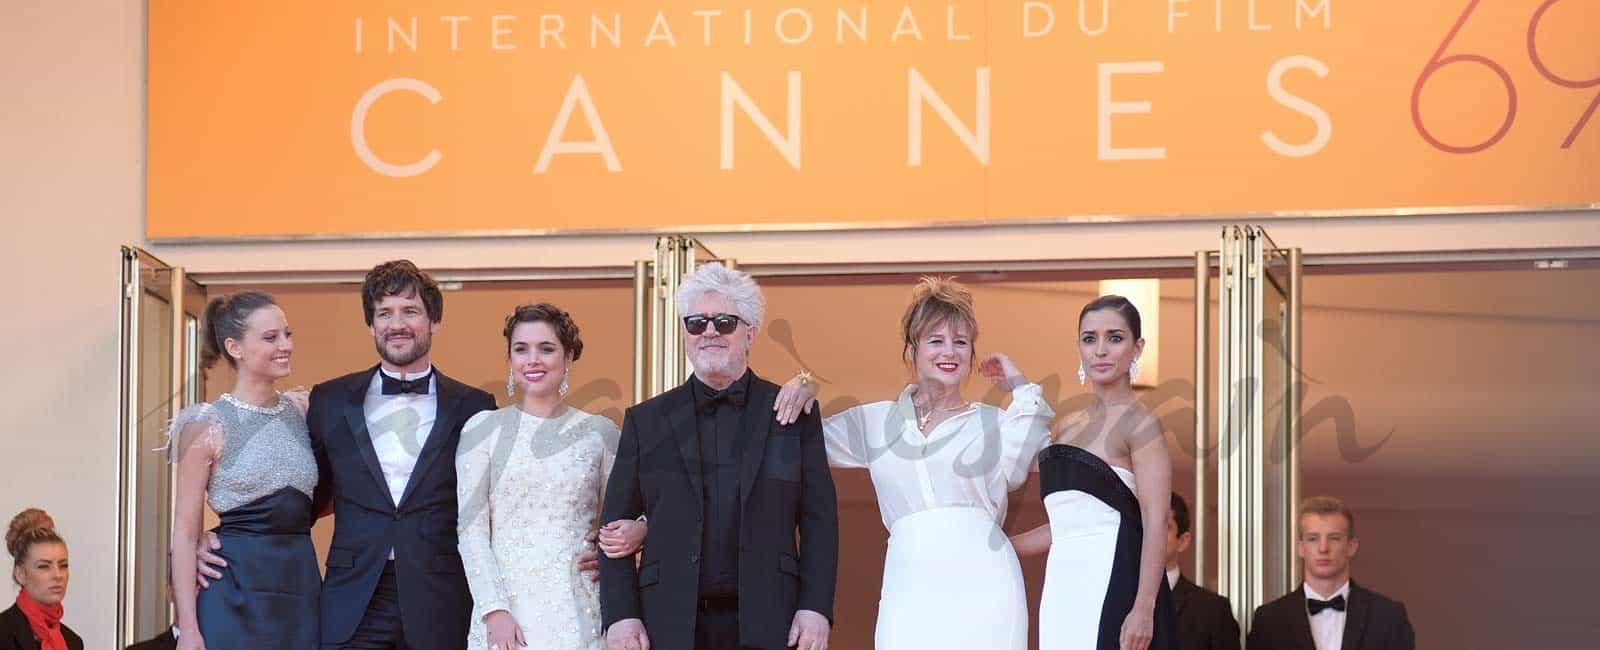 Festival de cine de Cannes: Espectacular alfombra roja para «Julieta»